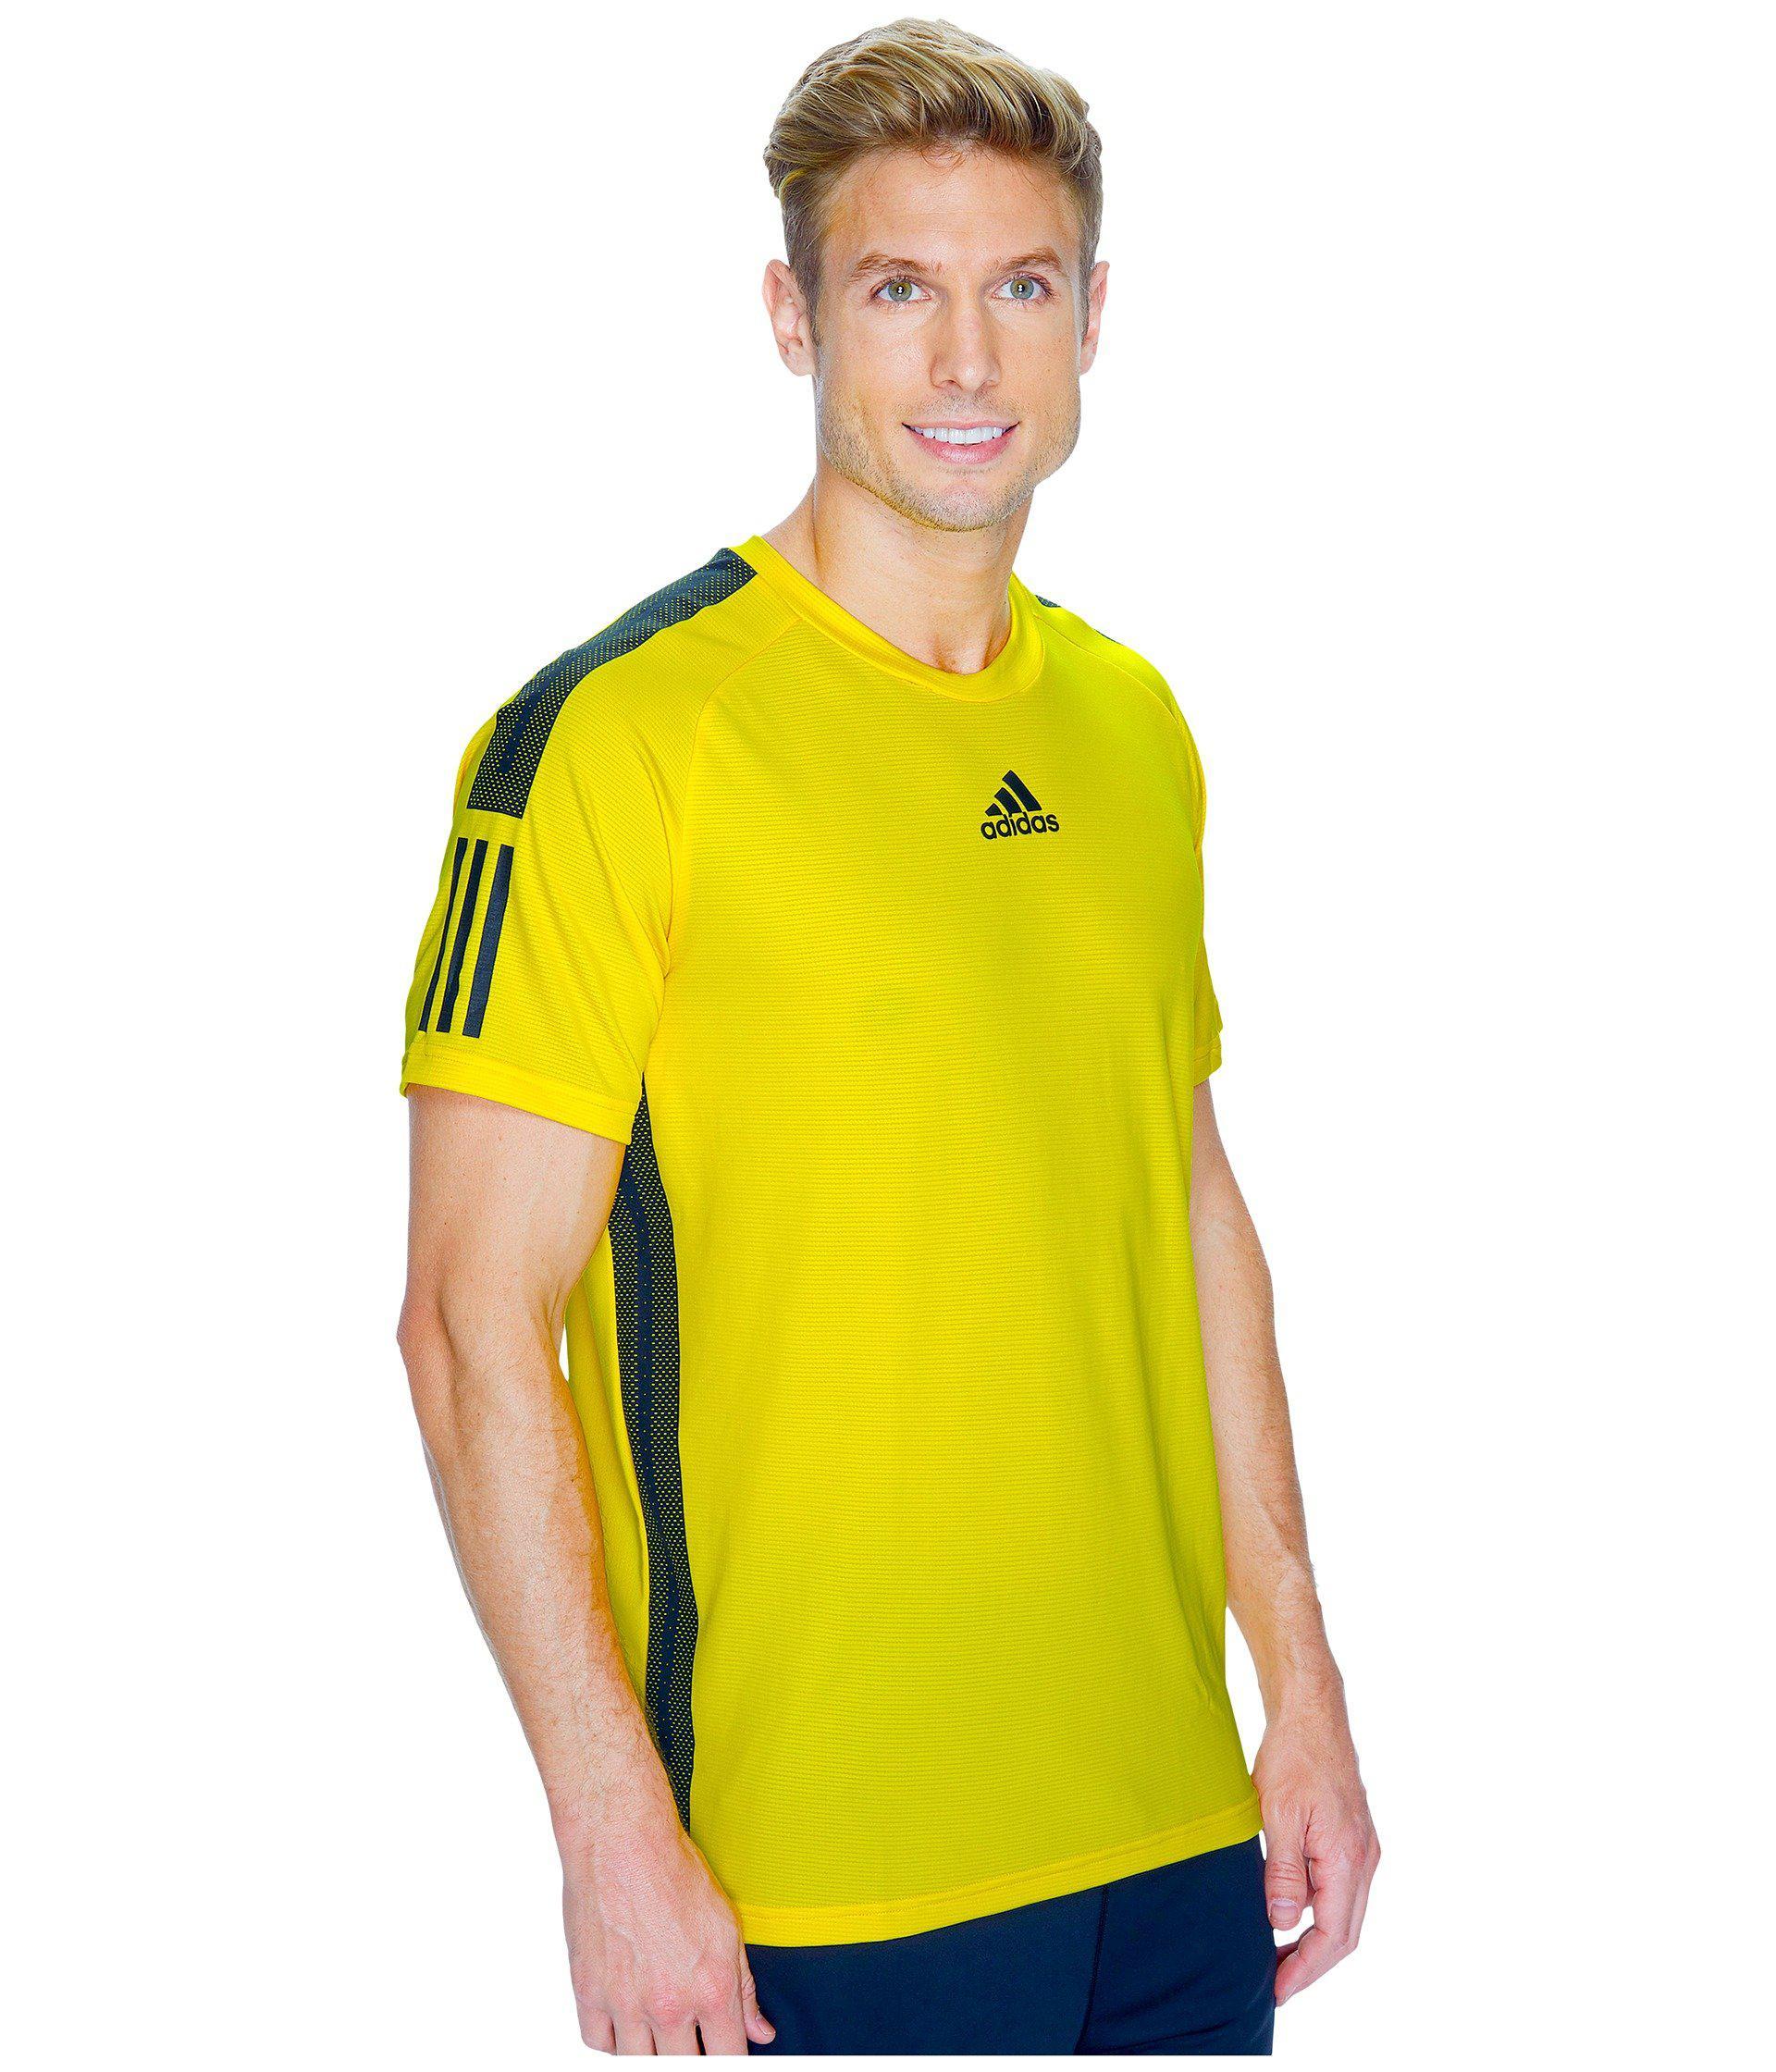 adidas shirt yellow black